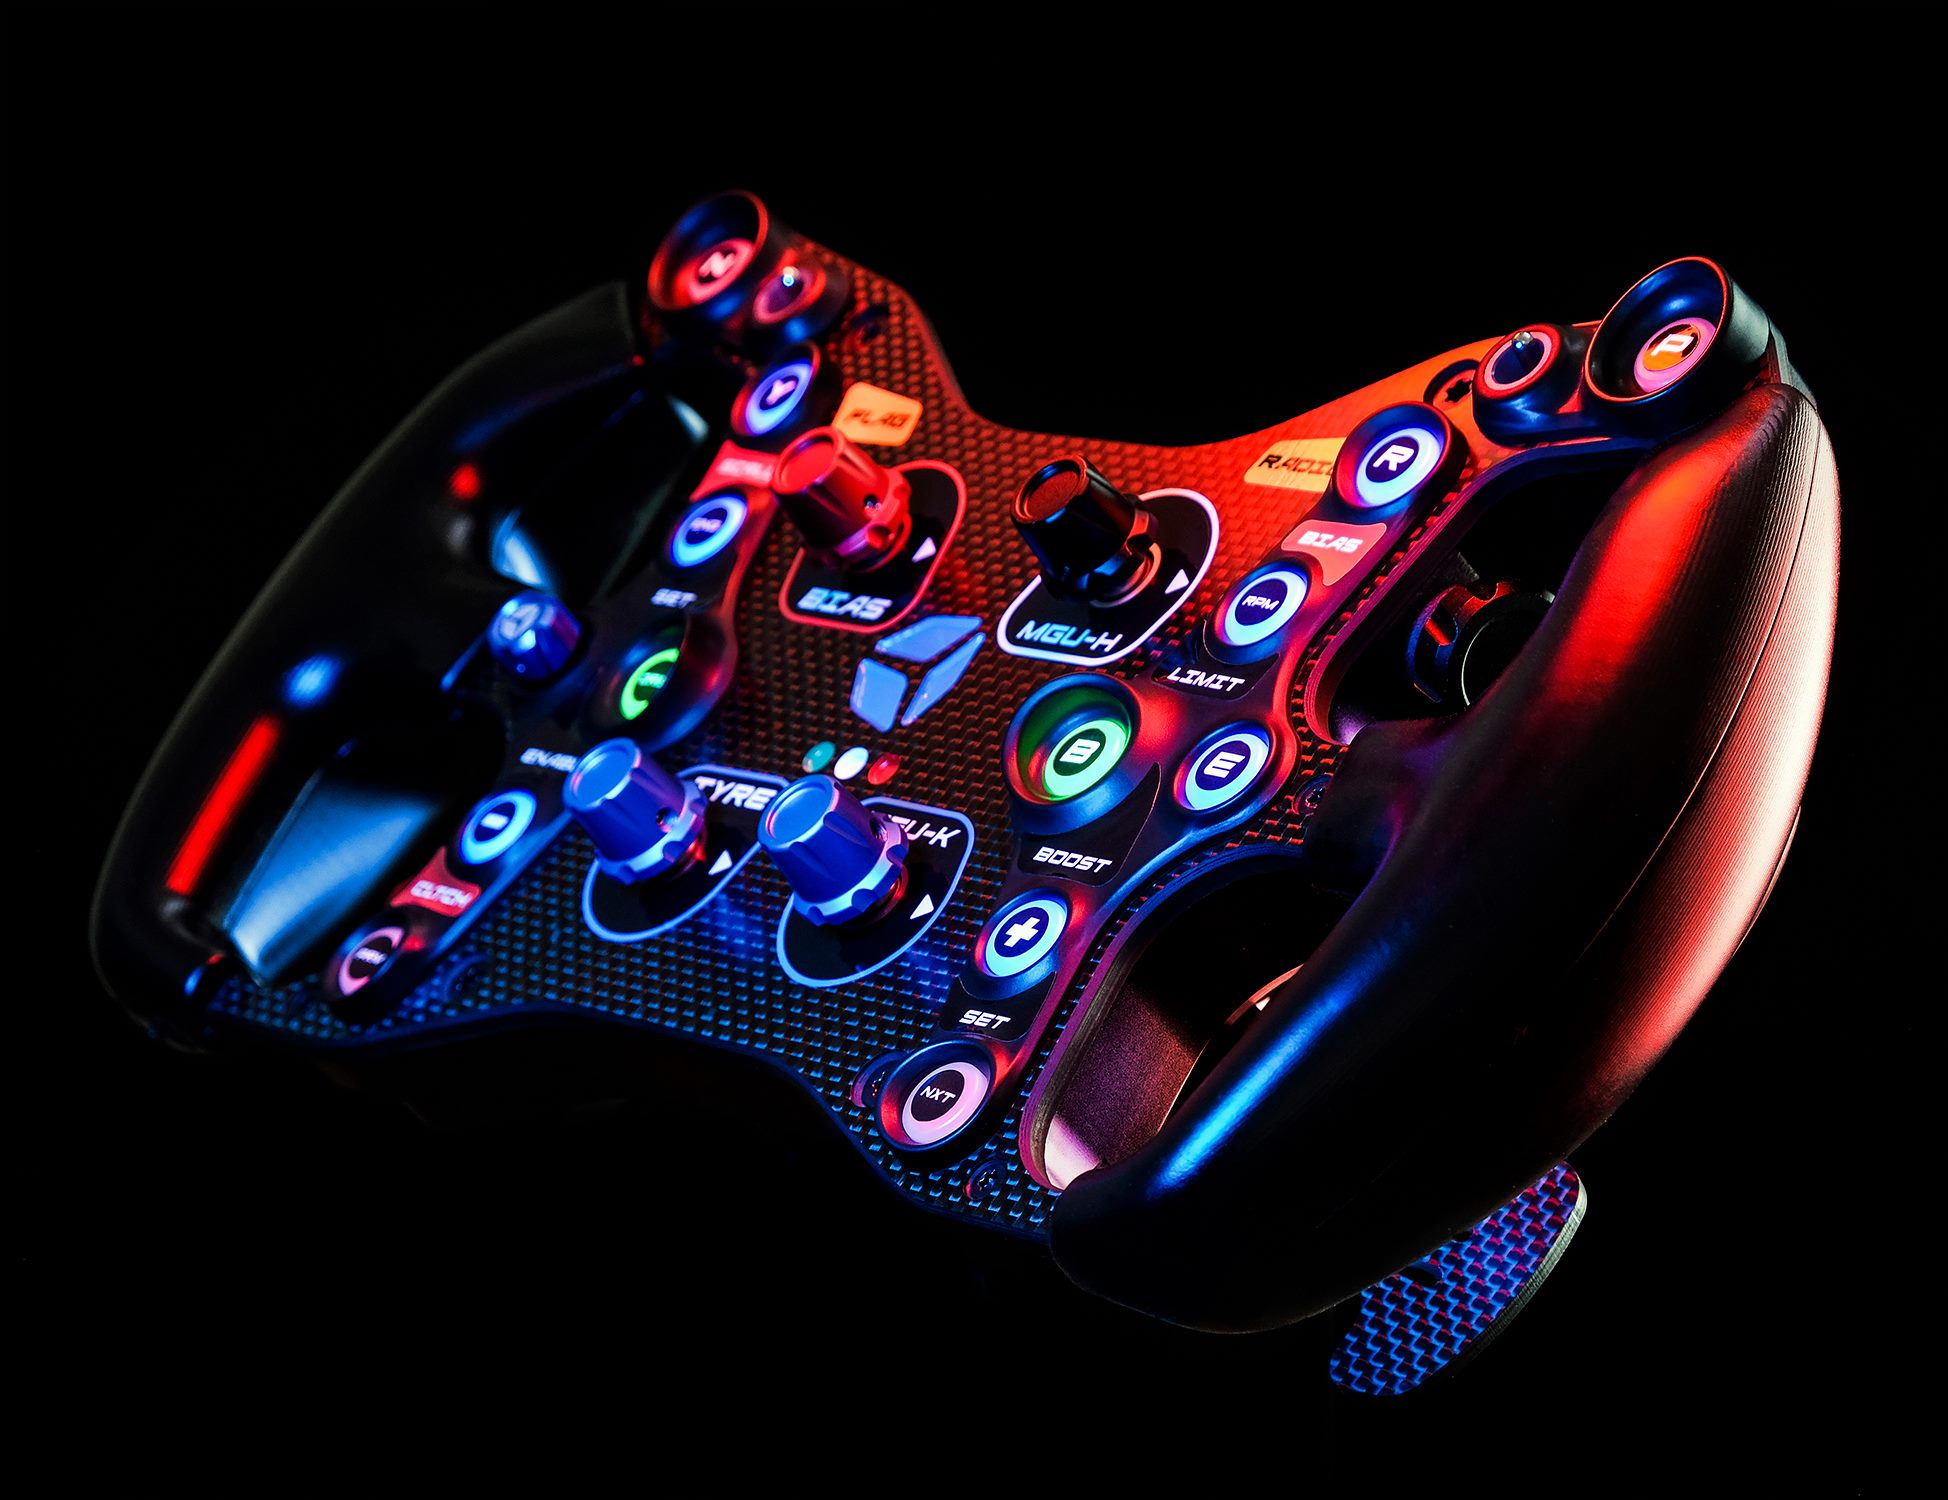 shop.gperformance.eu - Cube Controls Formula Pro sim racing wheel - G-Performance